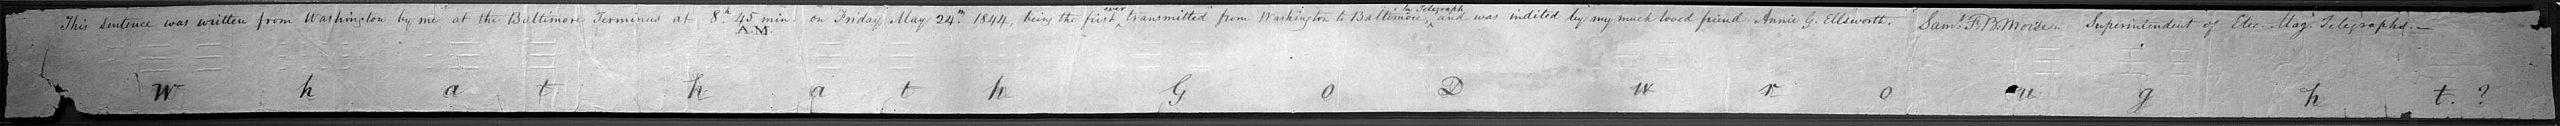 ilk telgraf